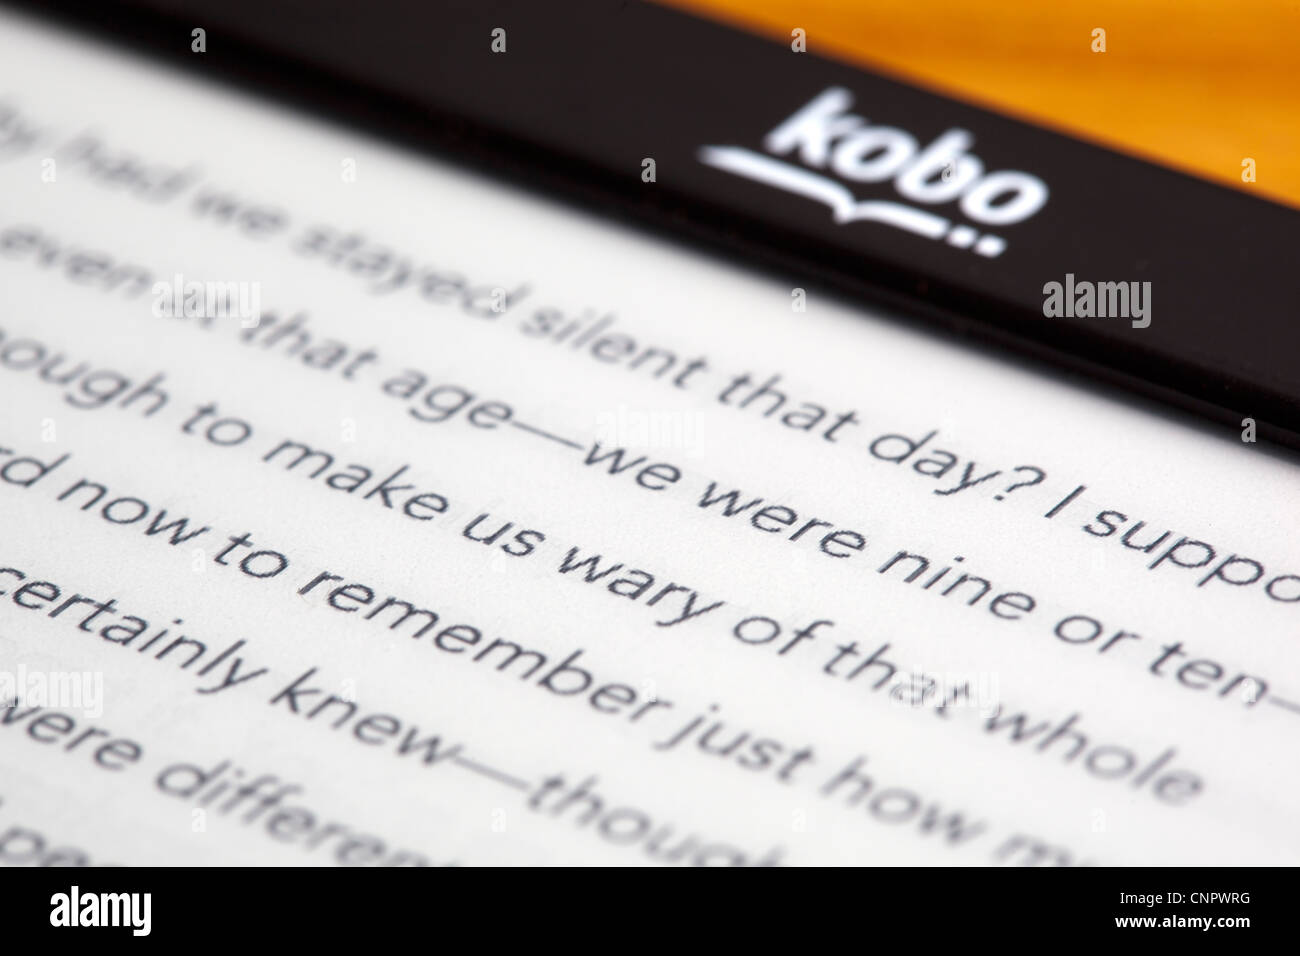 Kobo Ebook Reader - Stock Image